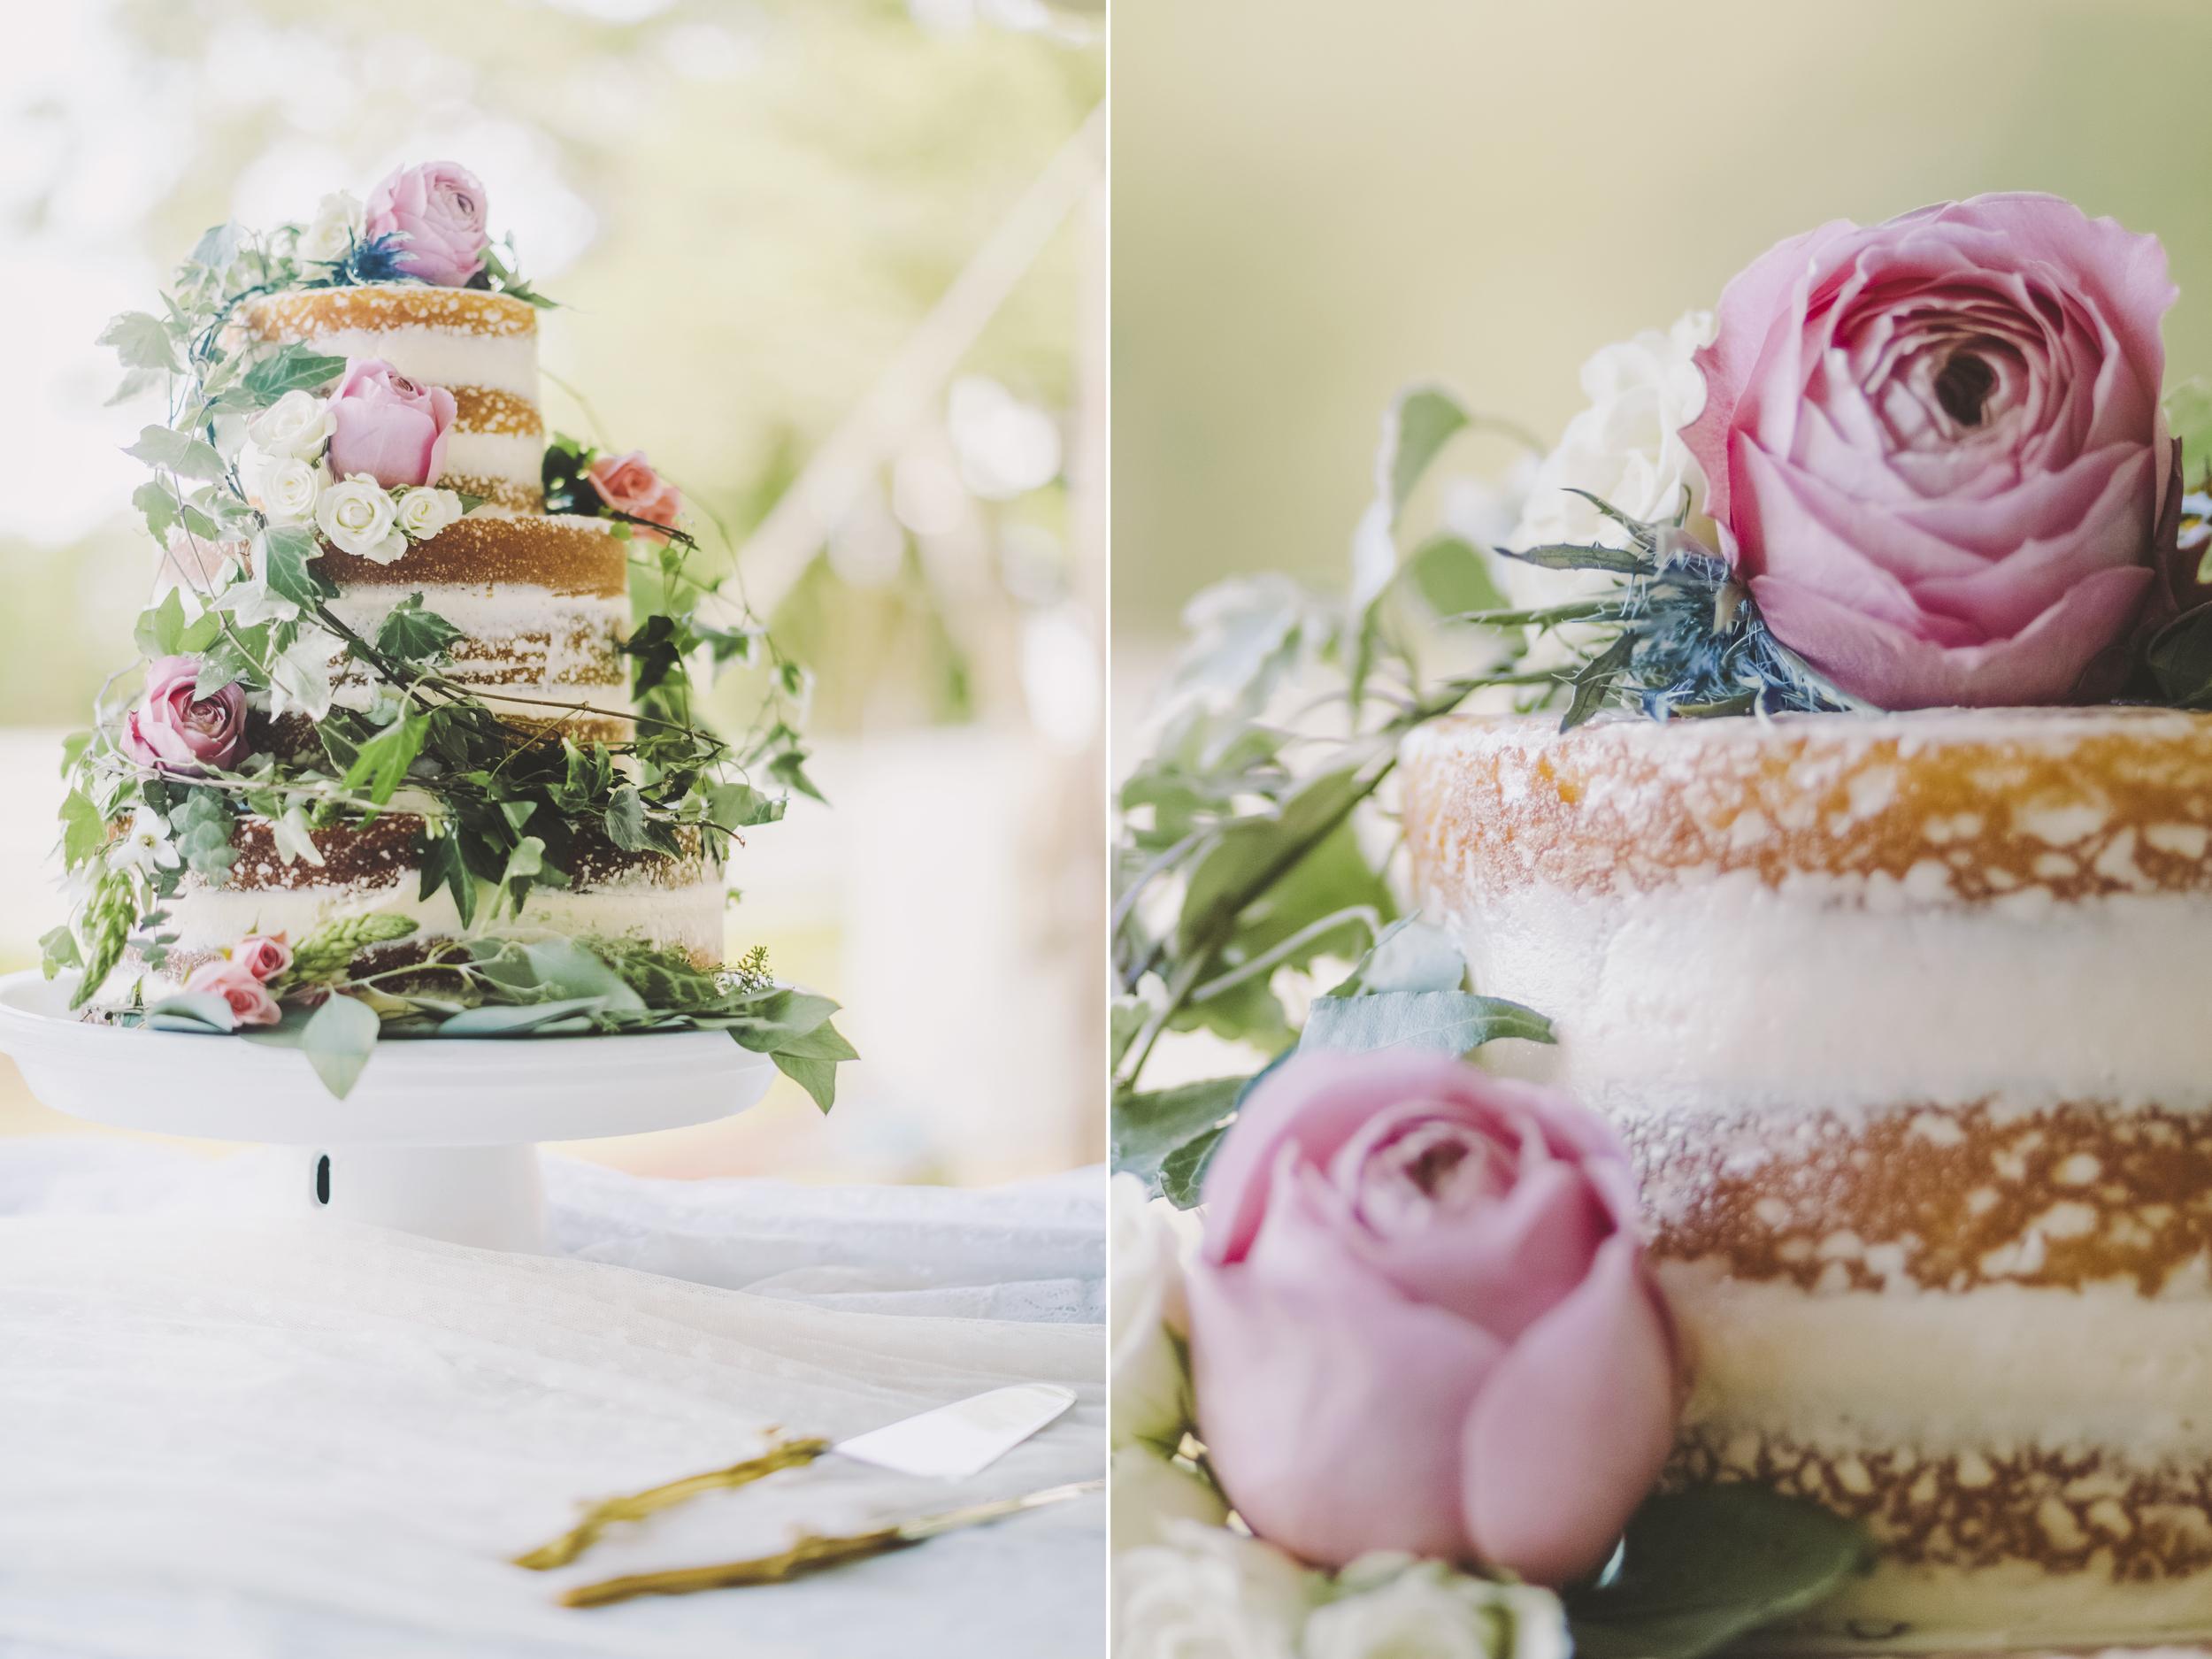 angie-diaz-photography-oahu-hawaii-wedding-tradewinds-ranch-108.jpg